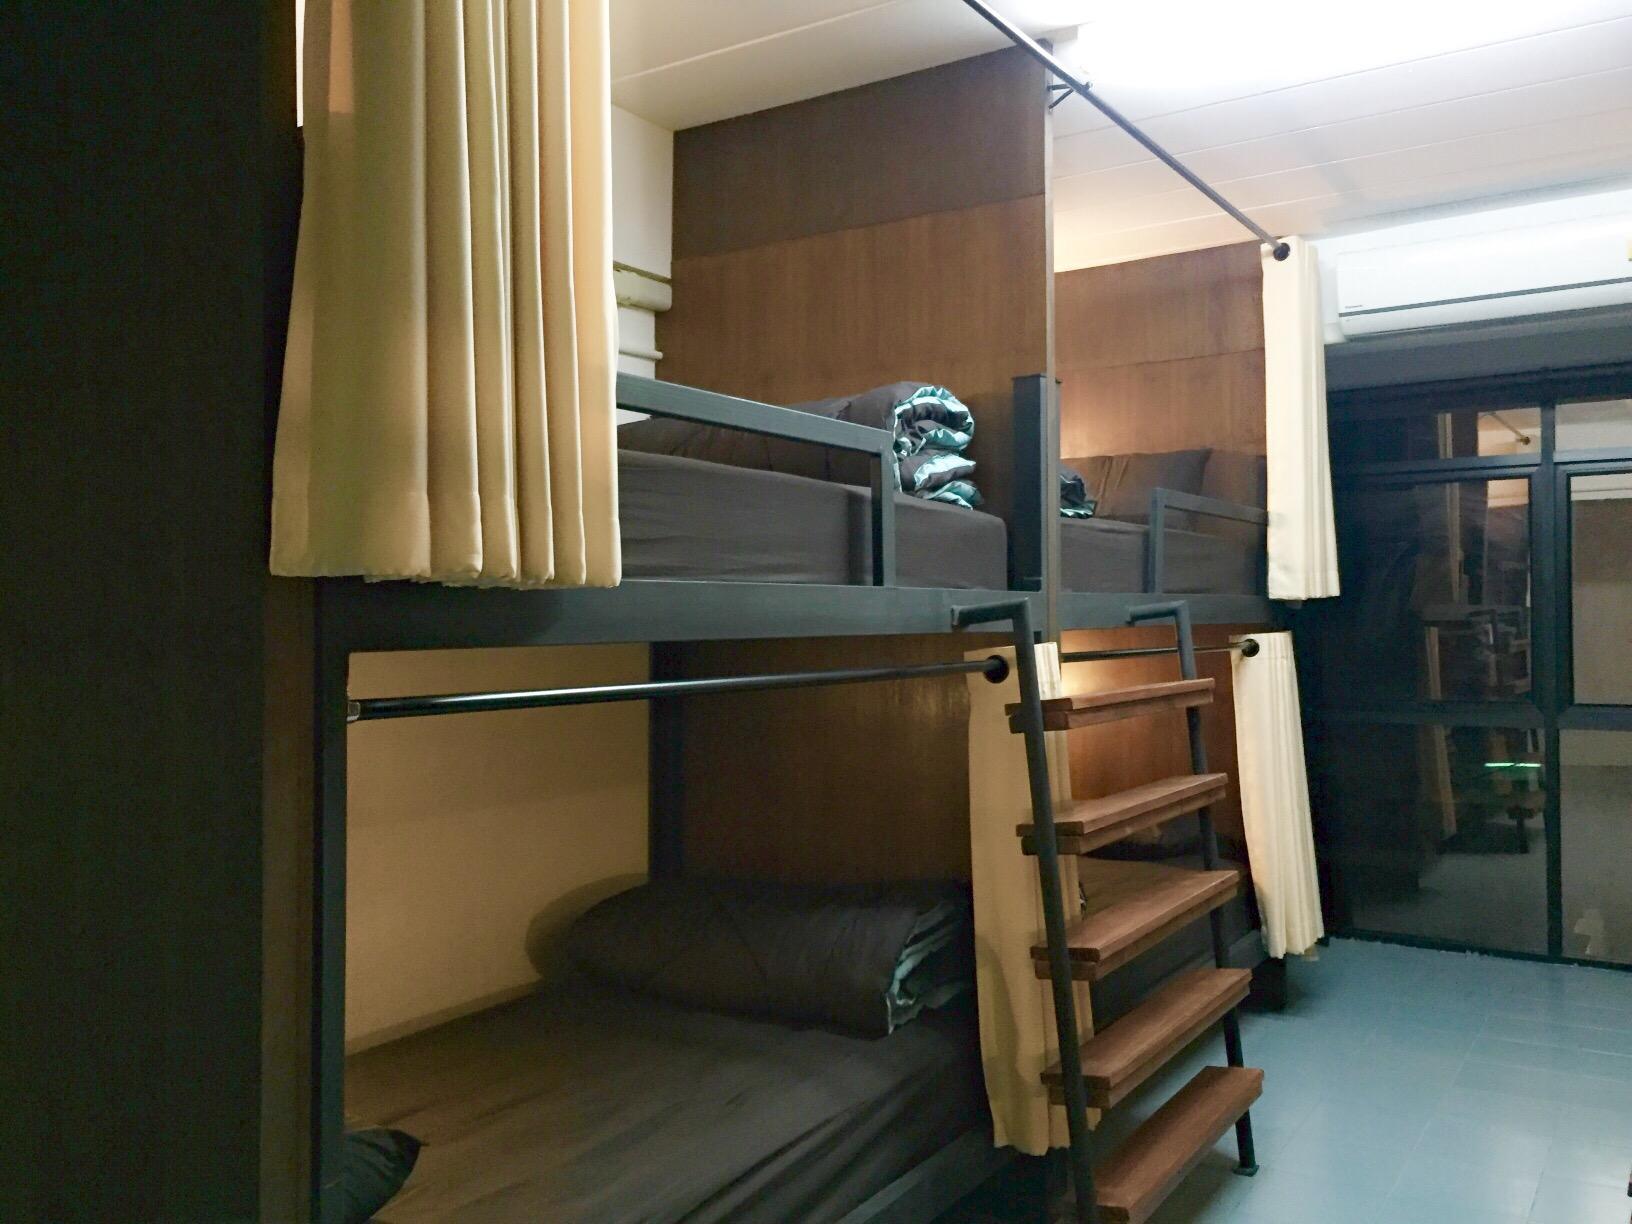 Bedtiny Hostel,Bedtiny Hostel